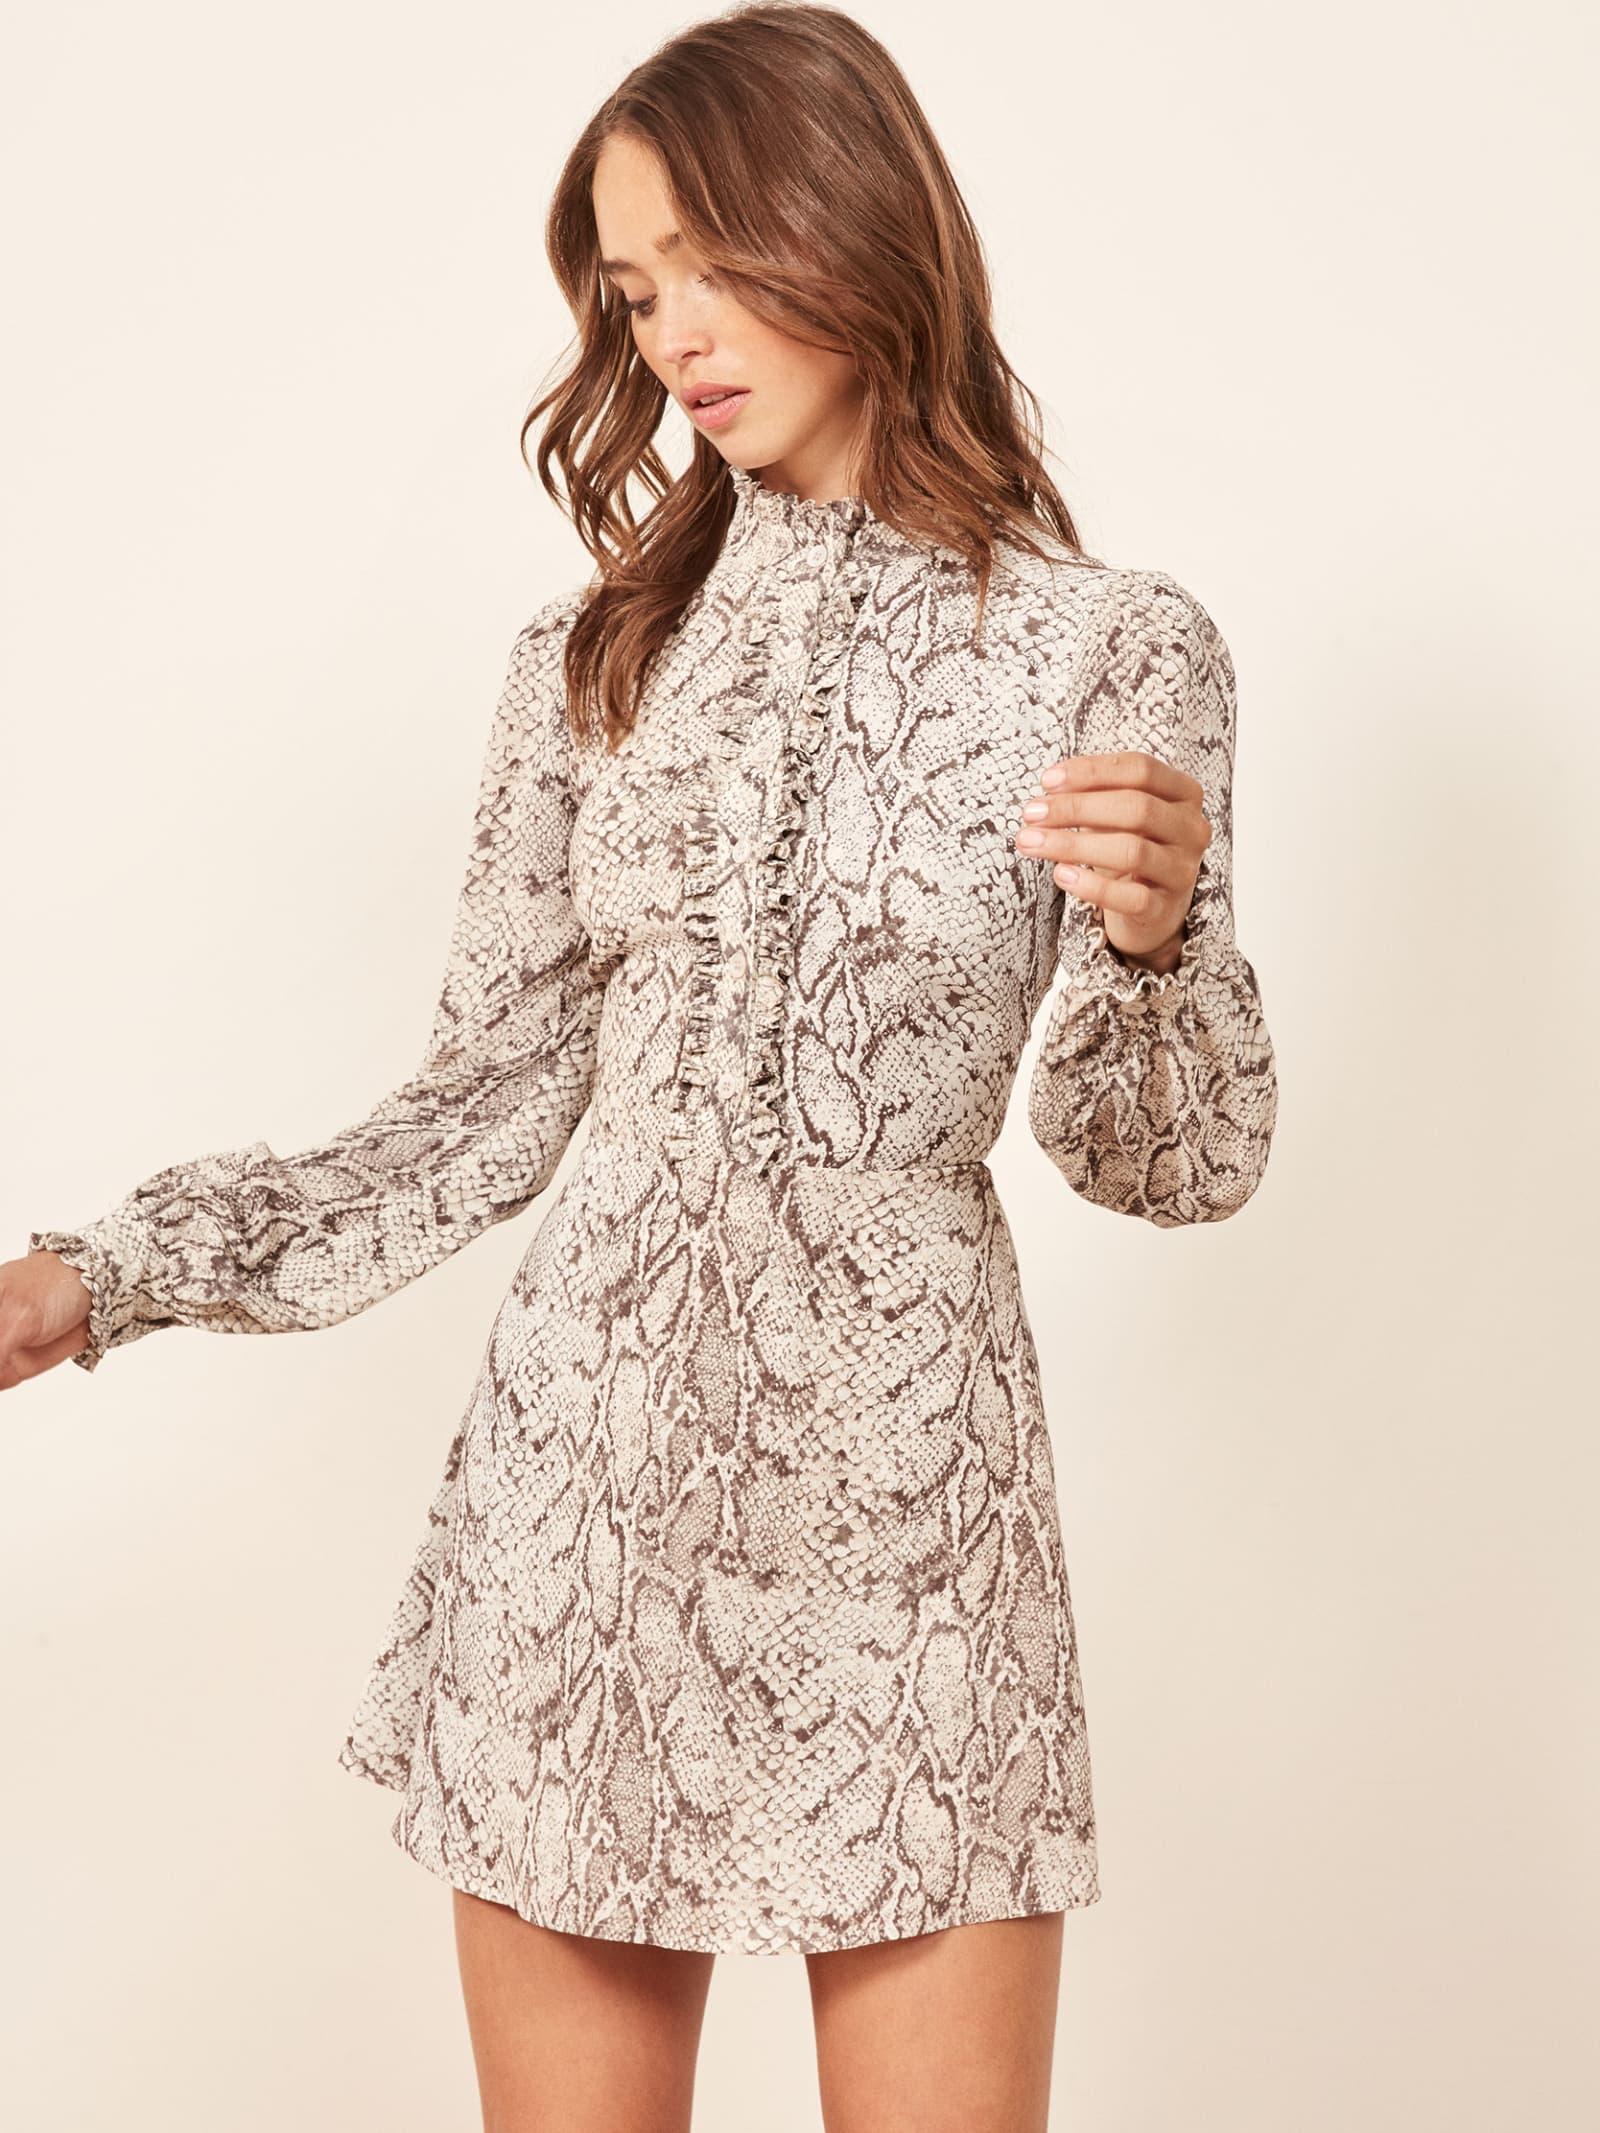 9943ba0637e Mathilda Dress - Reformation